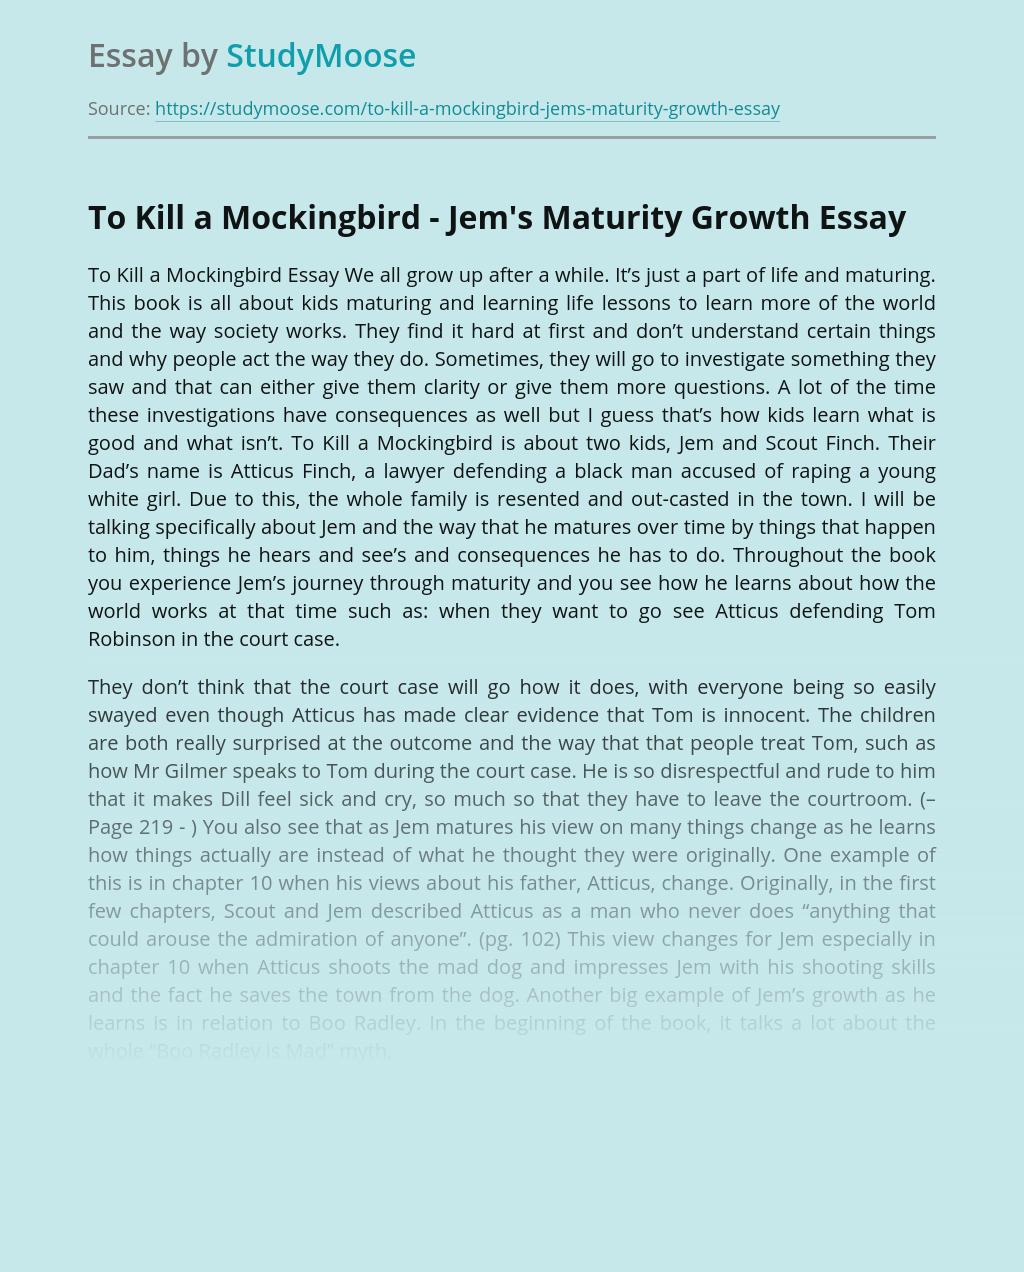 To Kill a Mockingbird - Jem's Maturity Growth